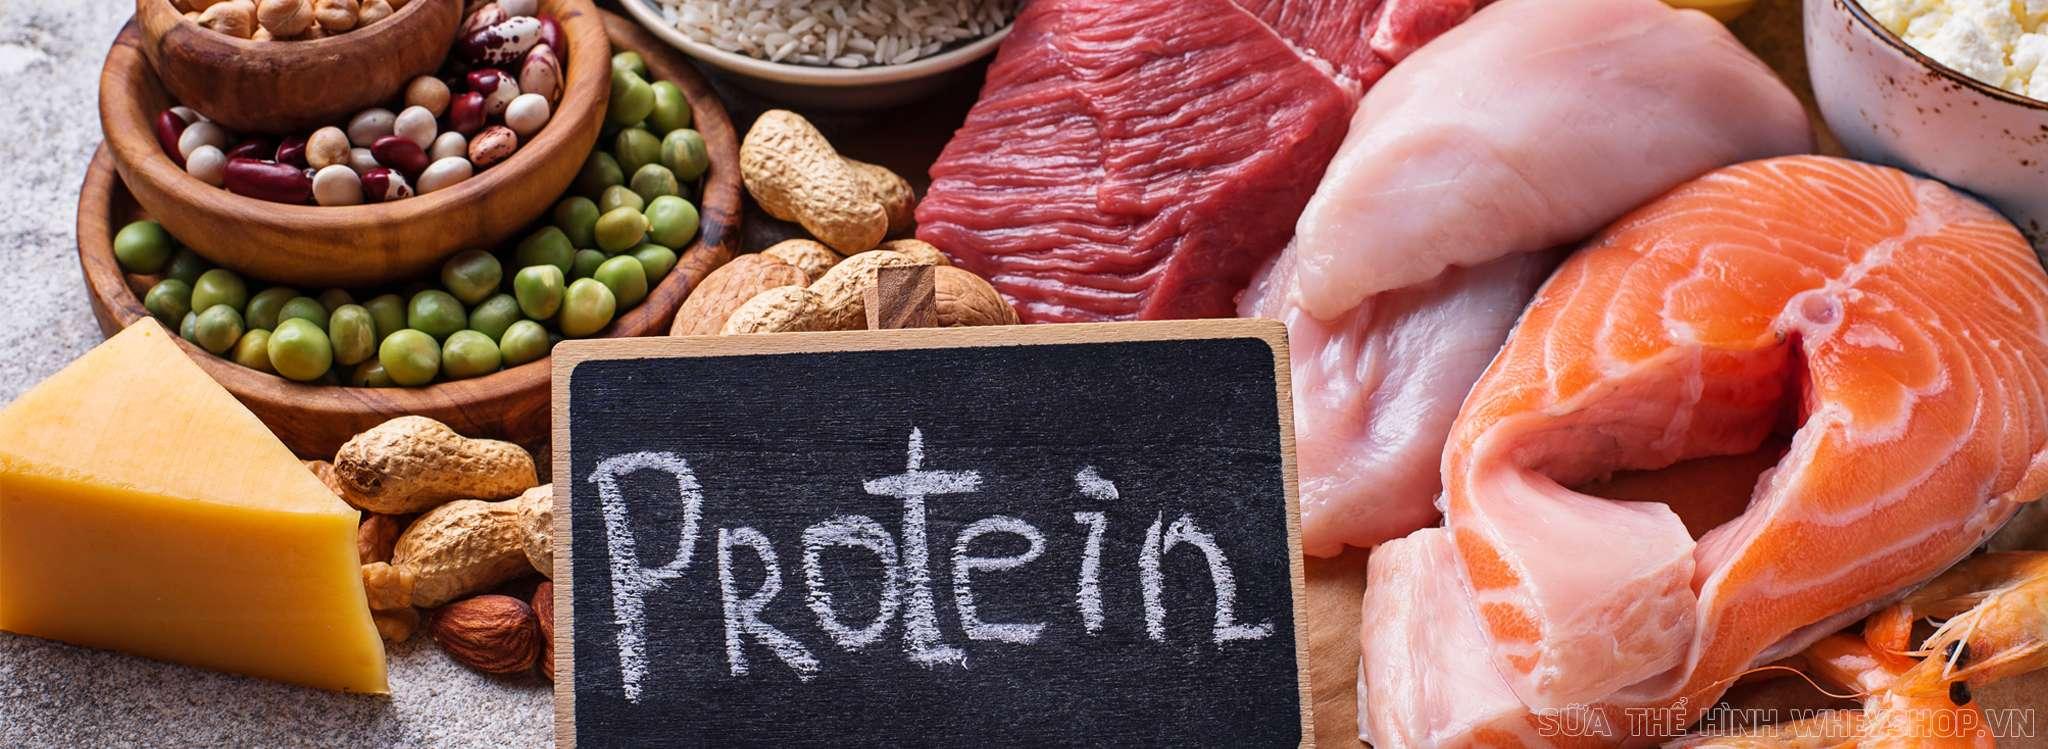 macro la gi cach tinh macro tang giảm can thuc pham gia protein